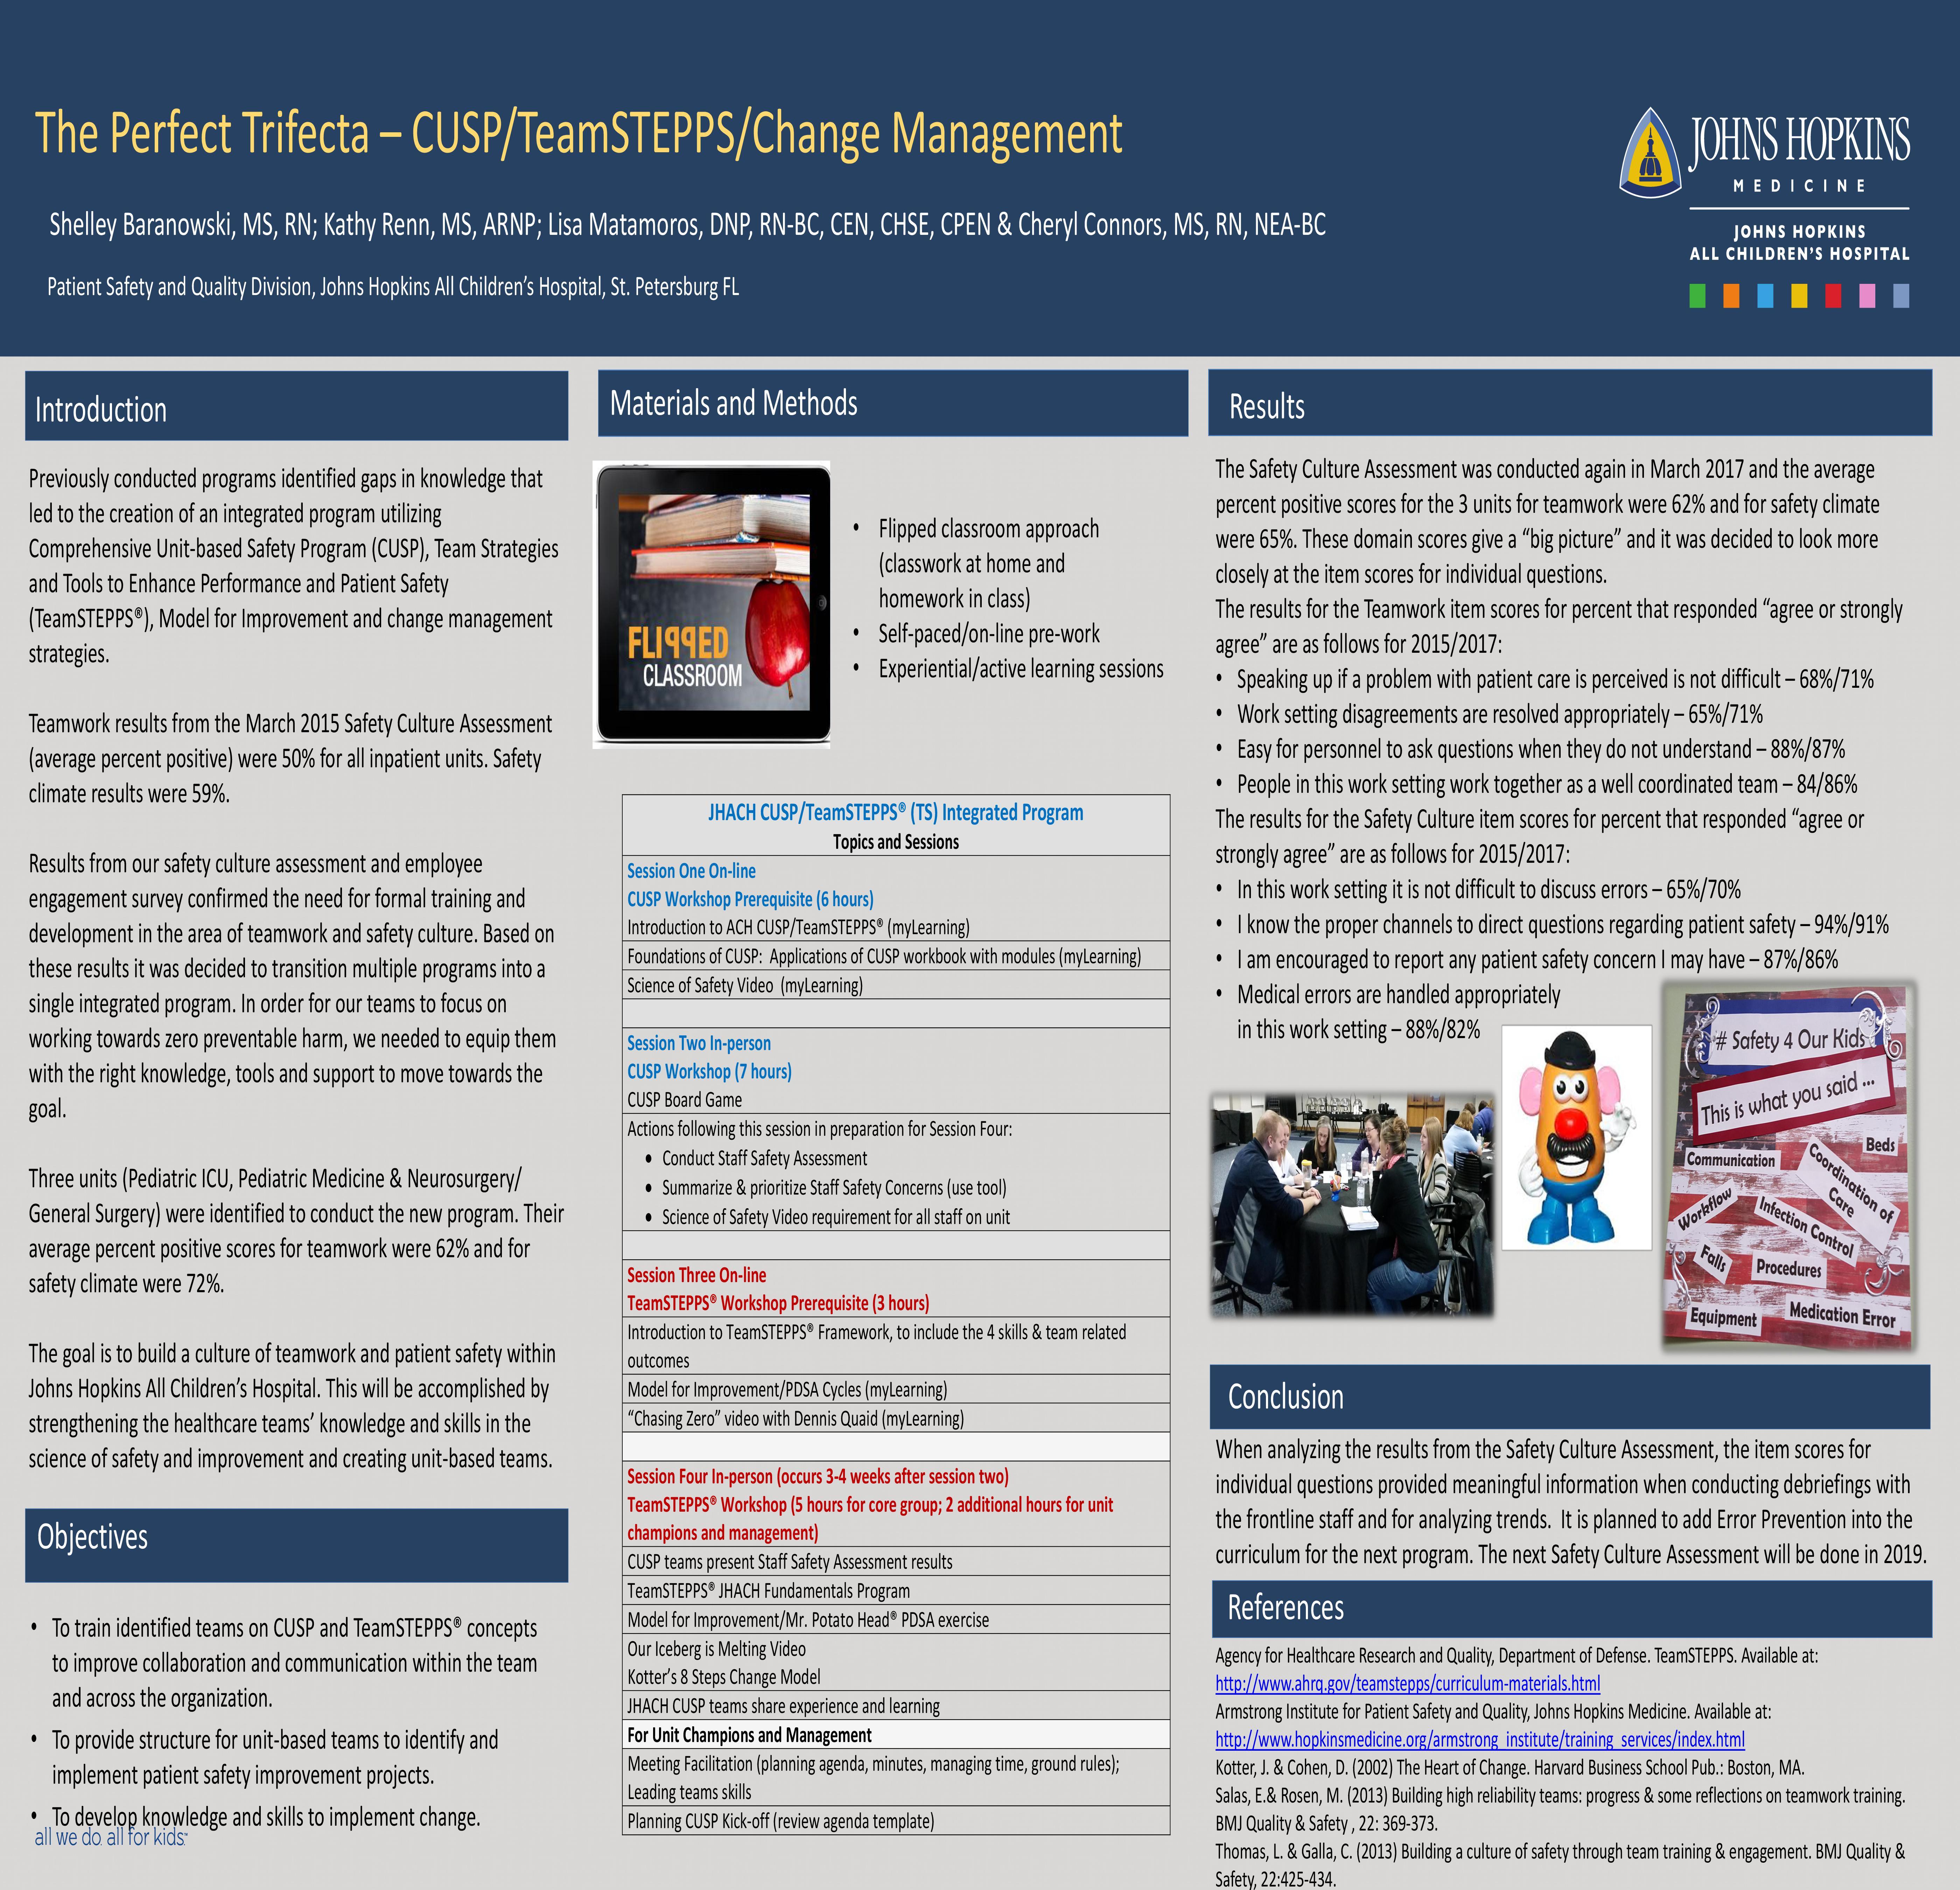 CUSP TS CM Integrated Program FINAL Poster